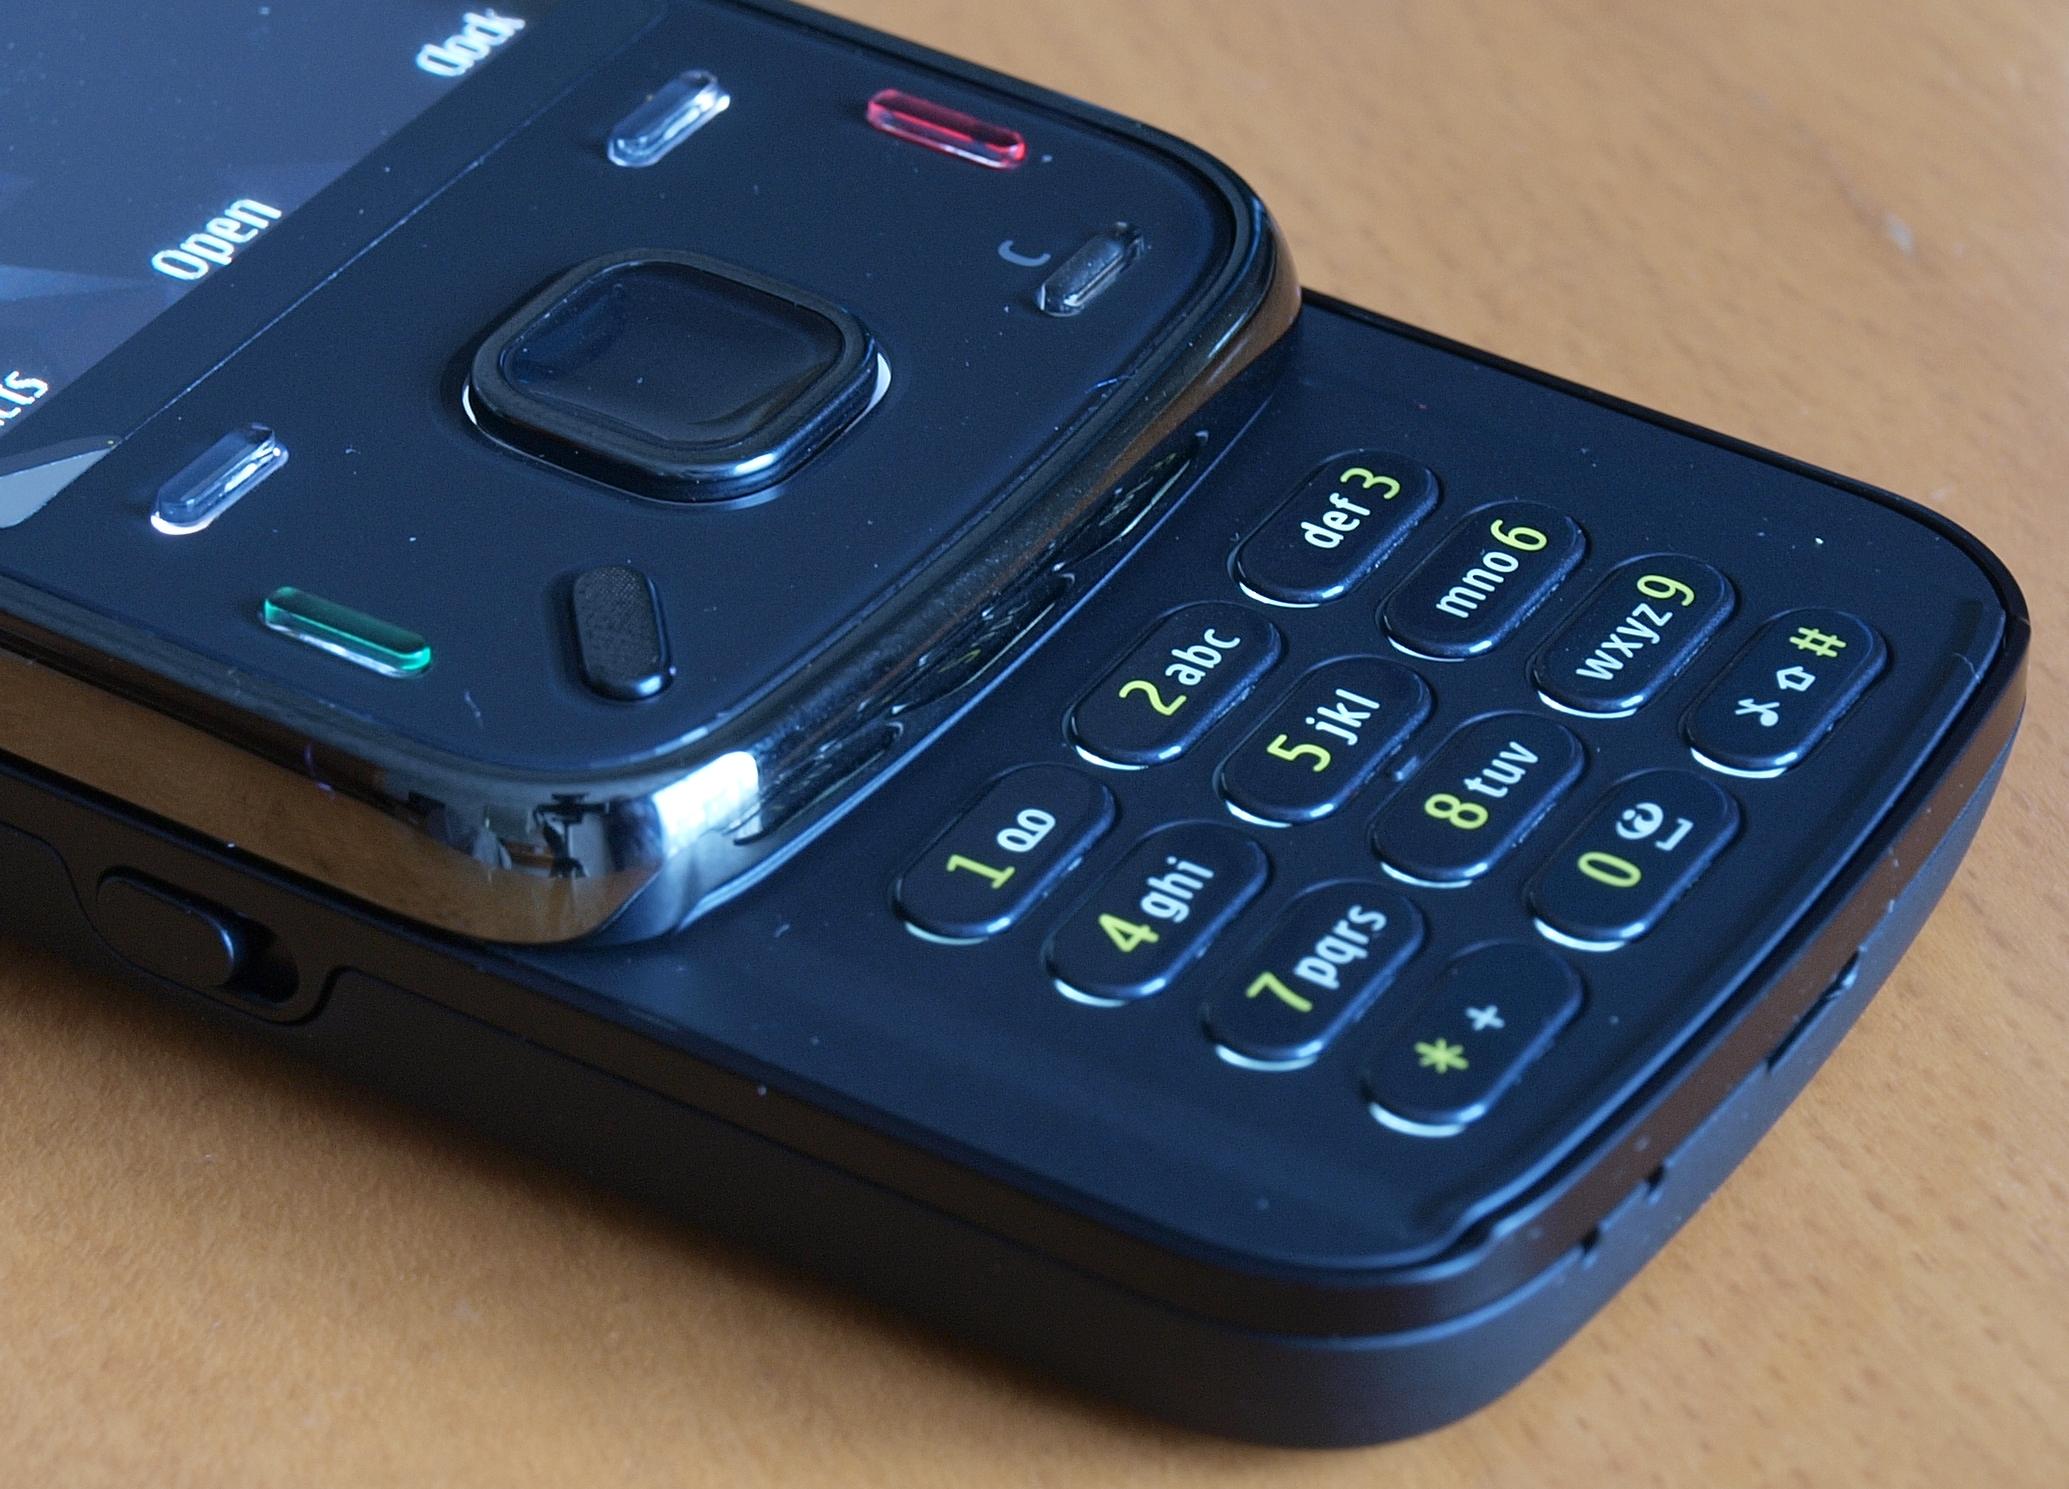 Nokia mobile java 3d games download